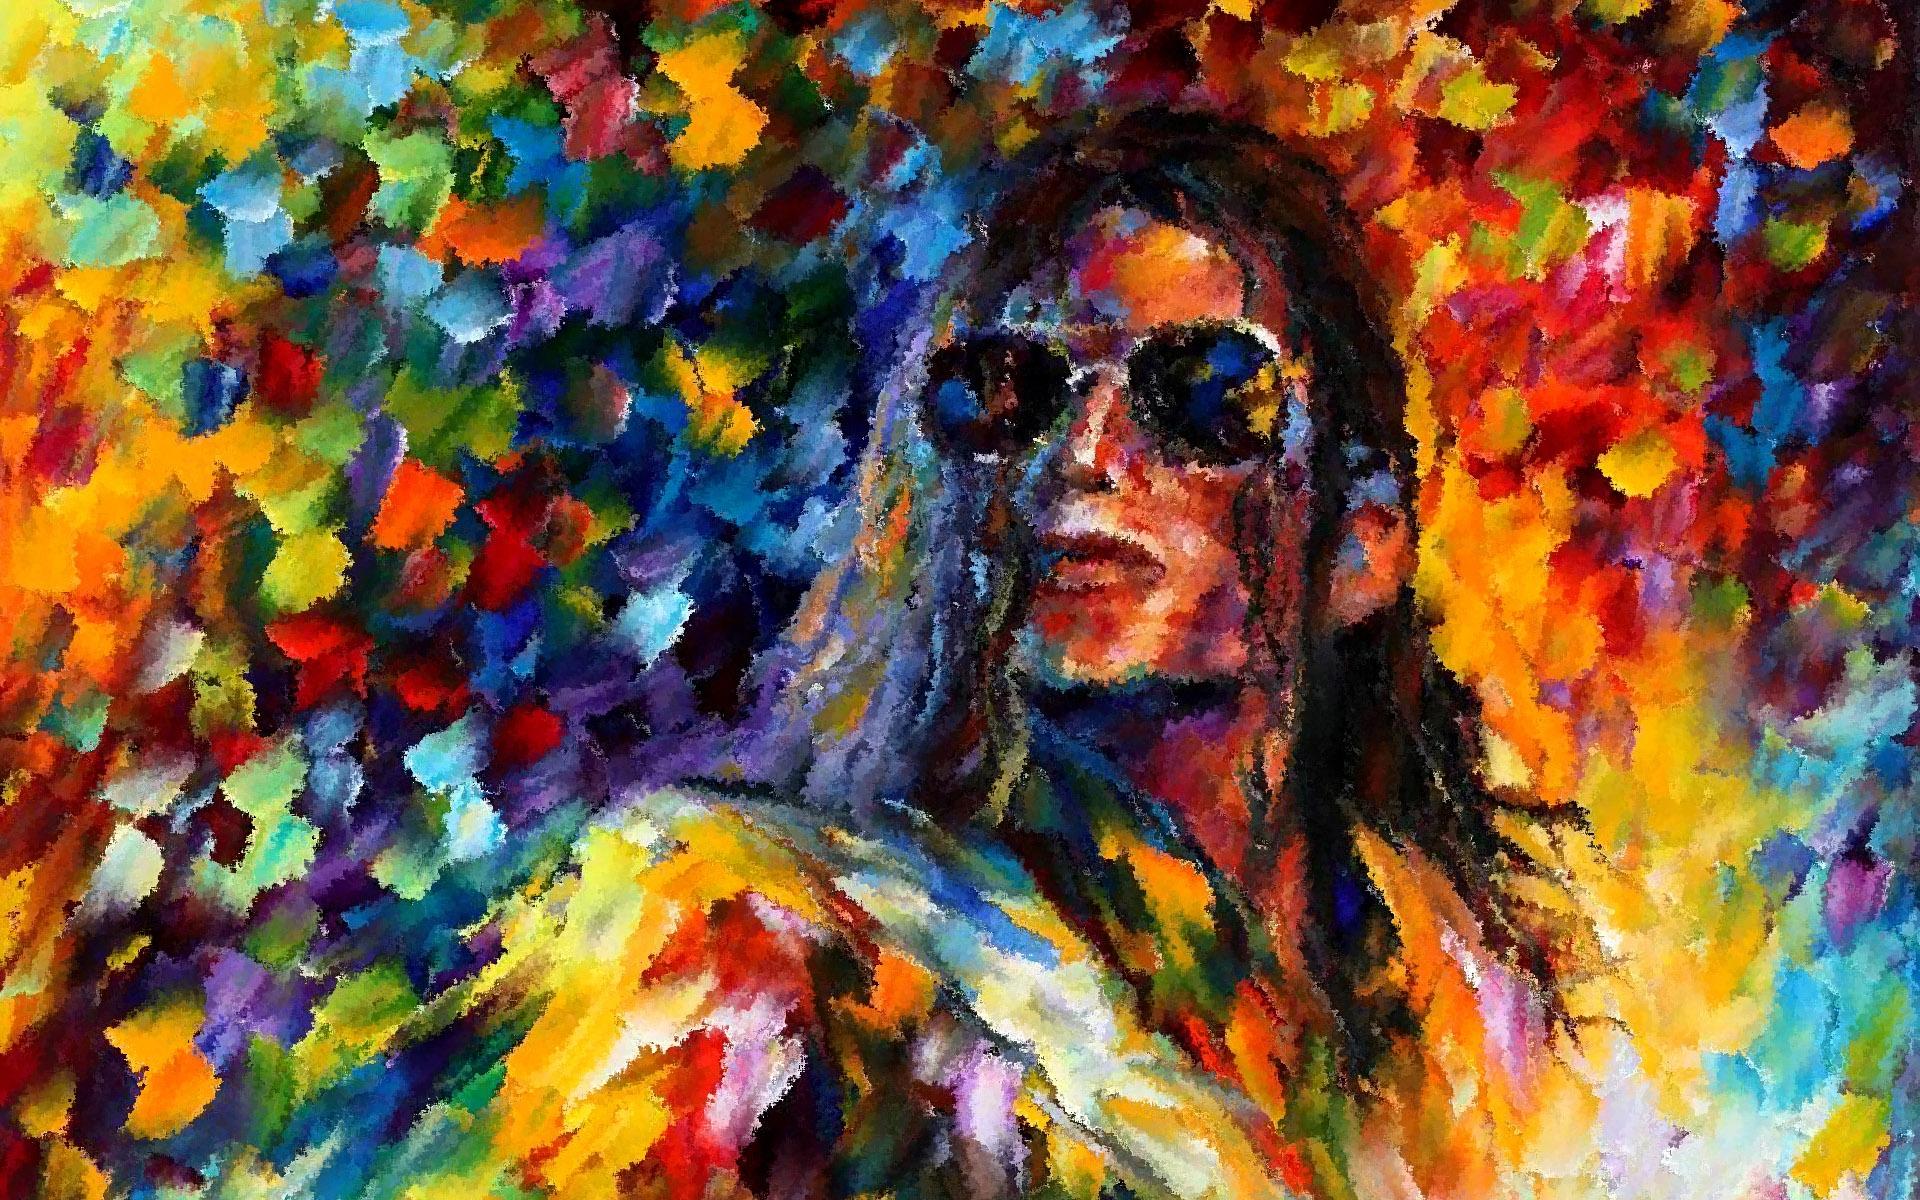 famous paintings michael jackson art creative collection 2149871jpg 1920x1200